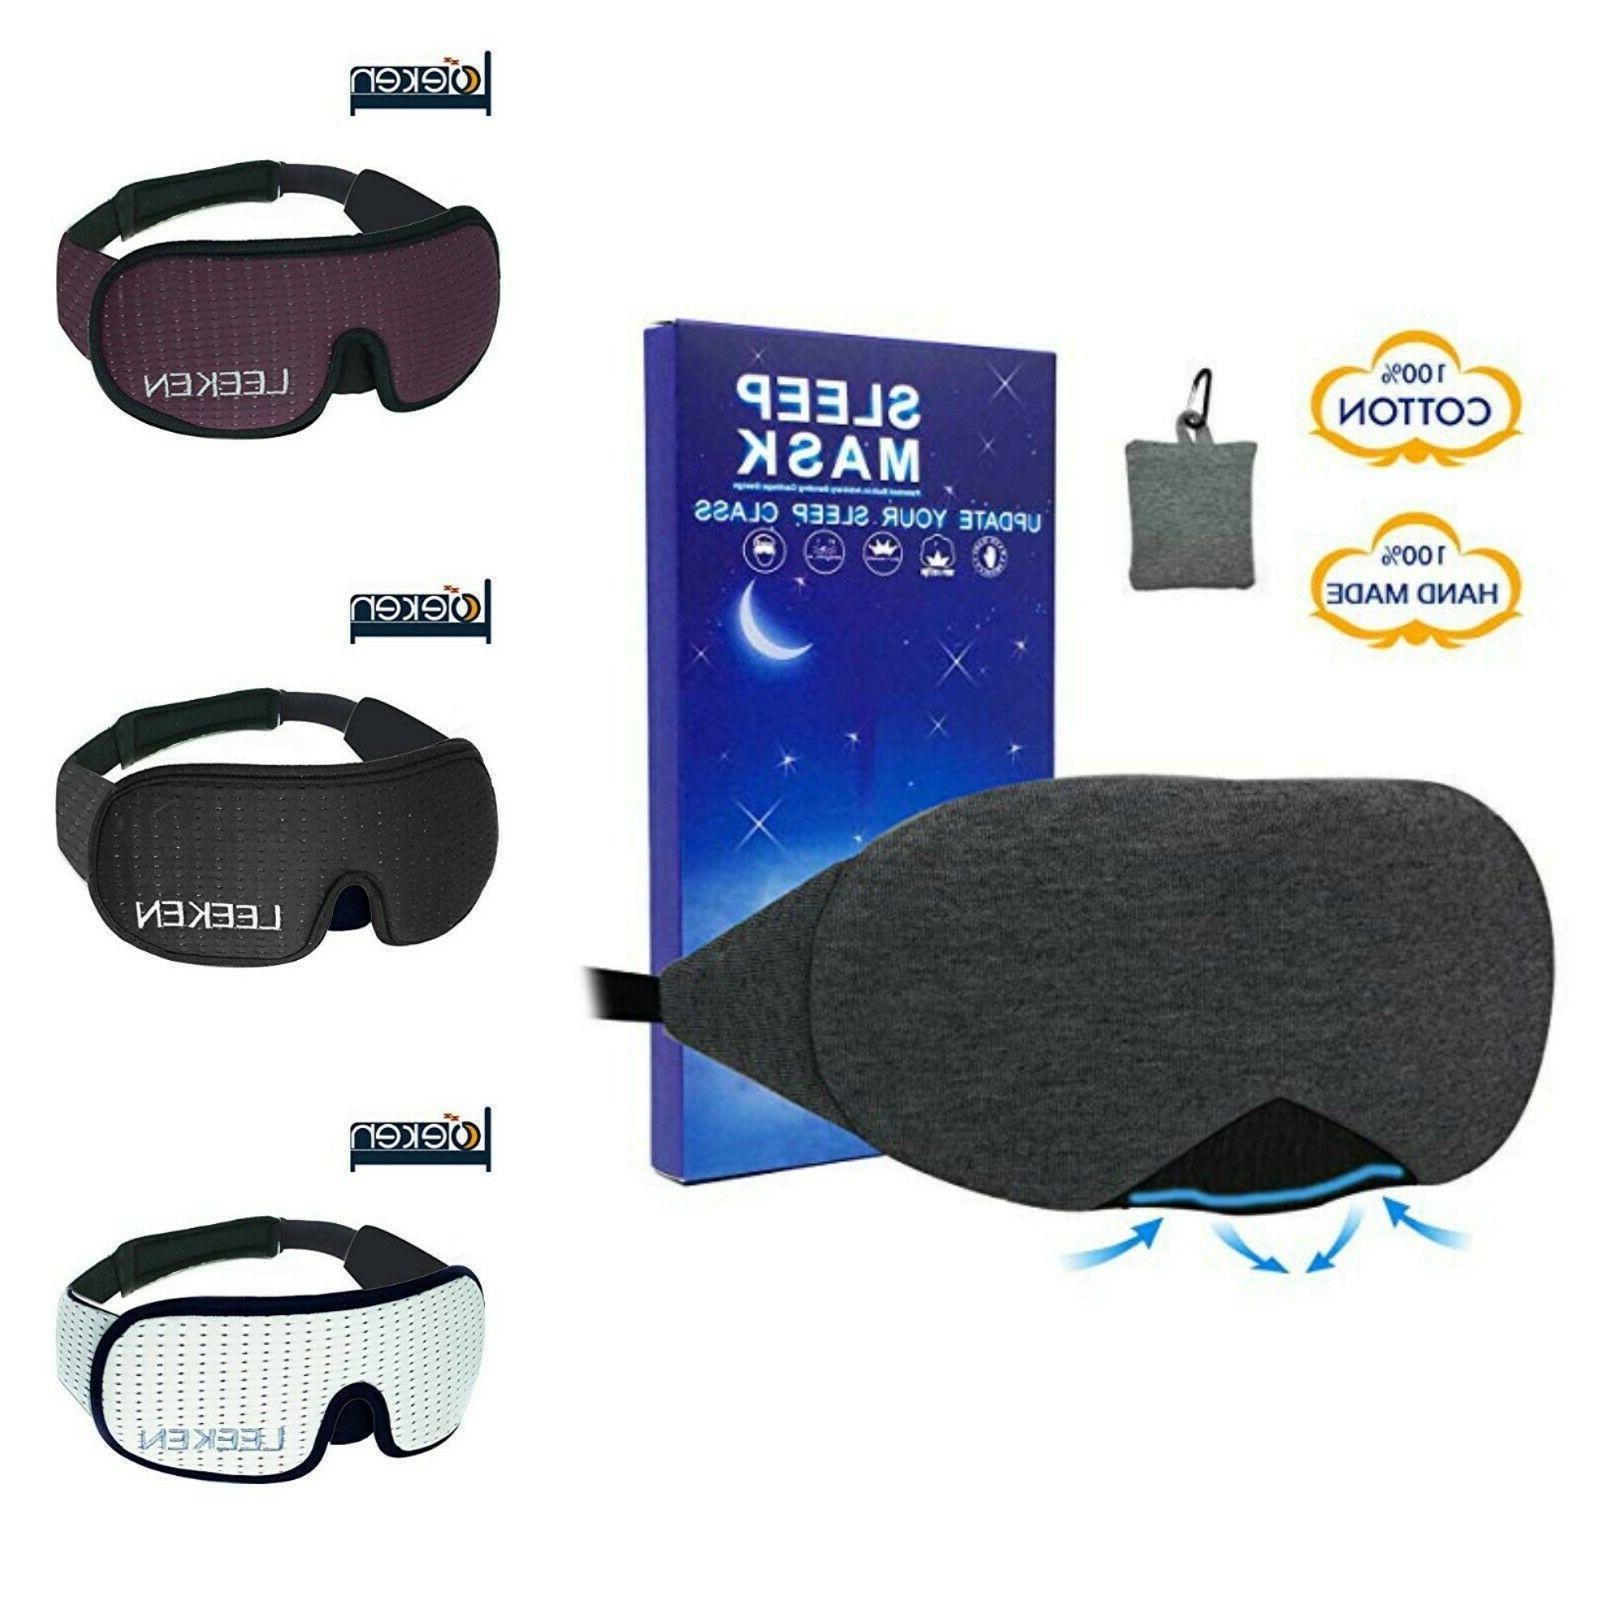 3D Sleeping Eye Mask Travel Nap Night Sleep Eyes Cover Breat